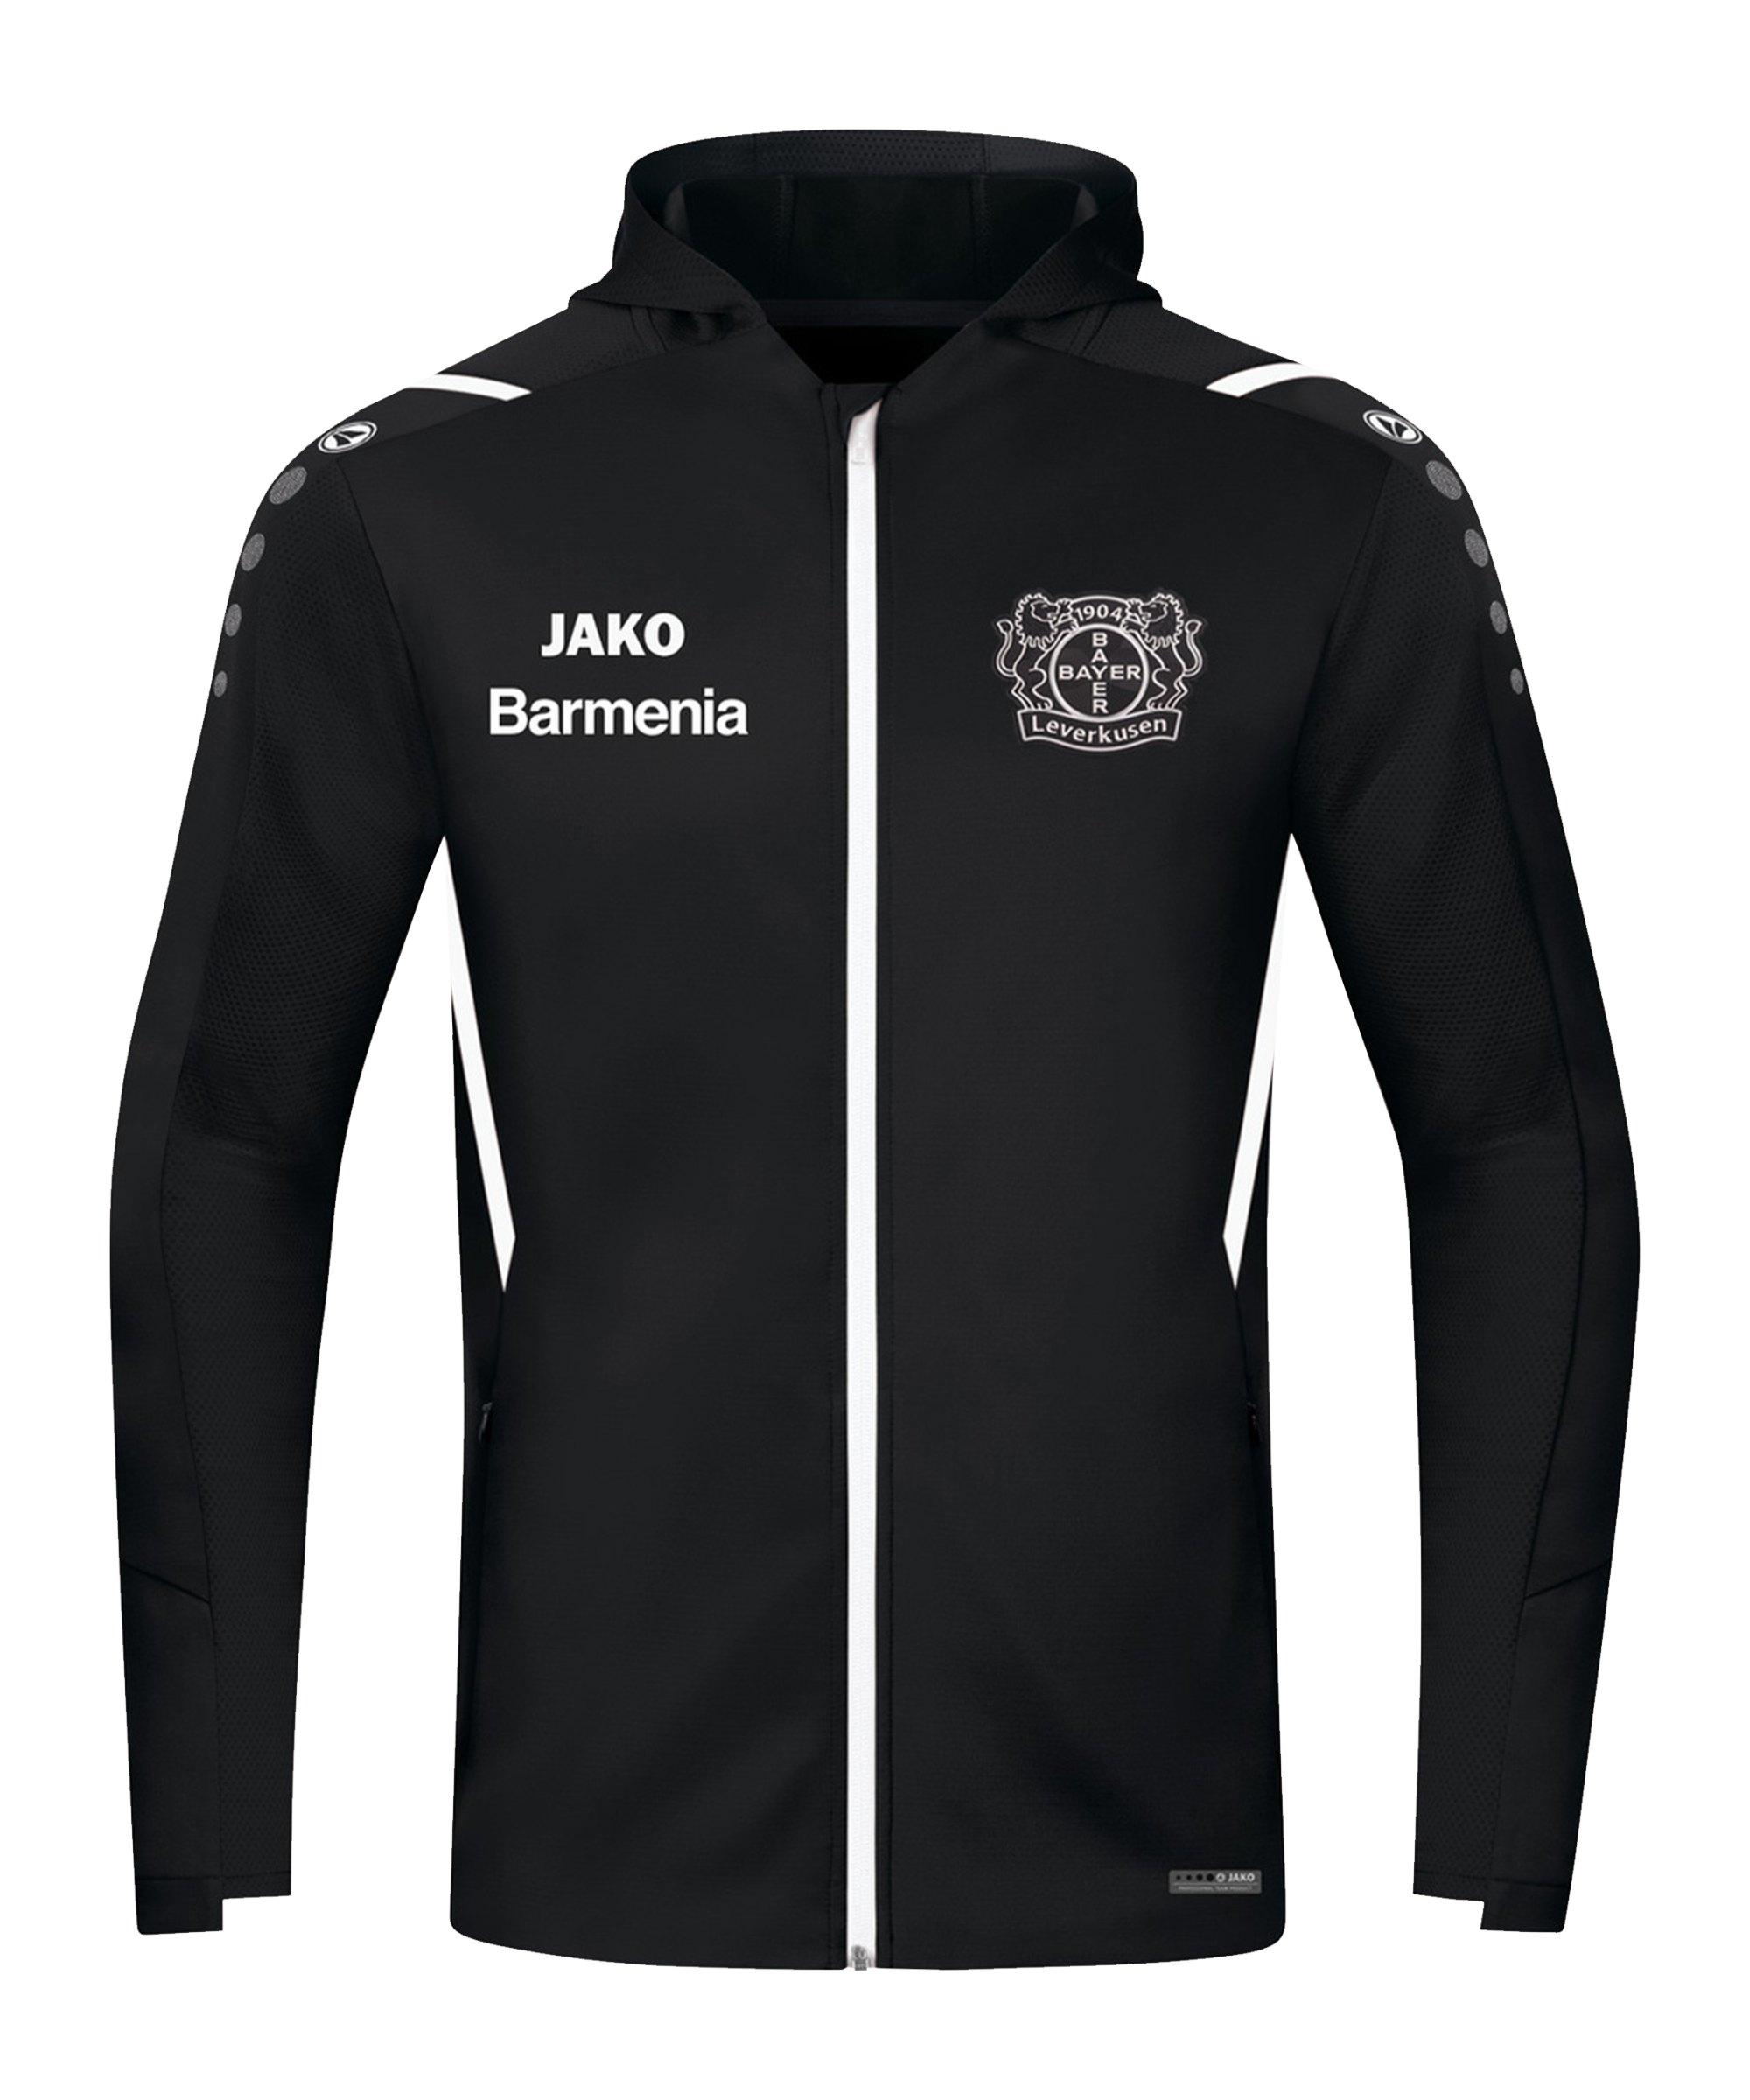 JAKO Bayer 04 Leverkusen Challenge Trainingsjacke Schwarz Weiss F802 - schwarz